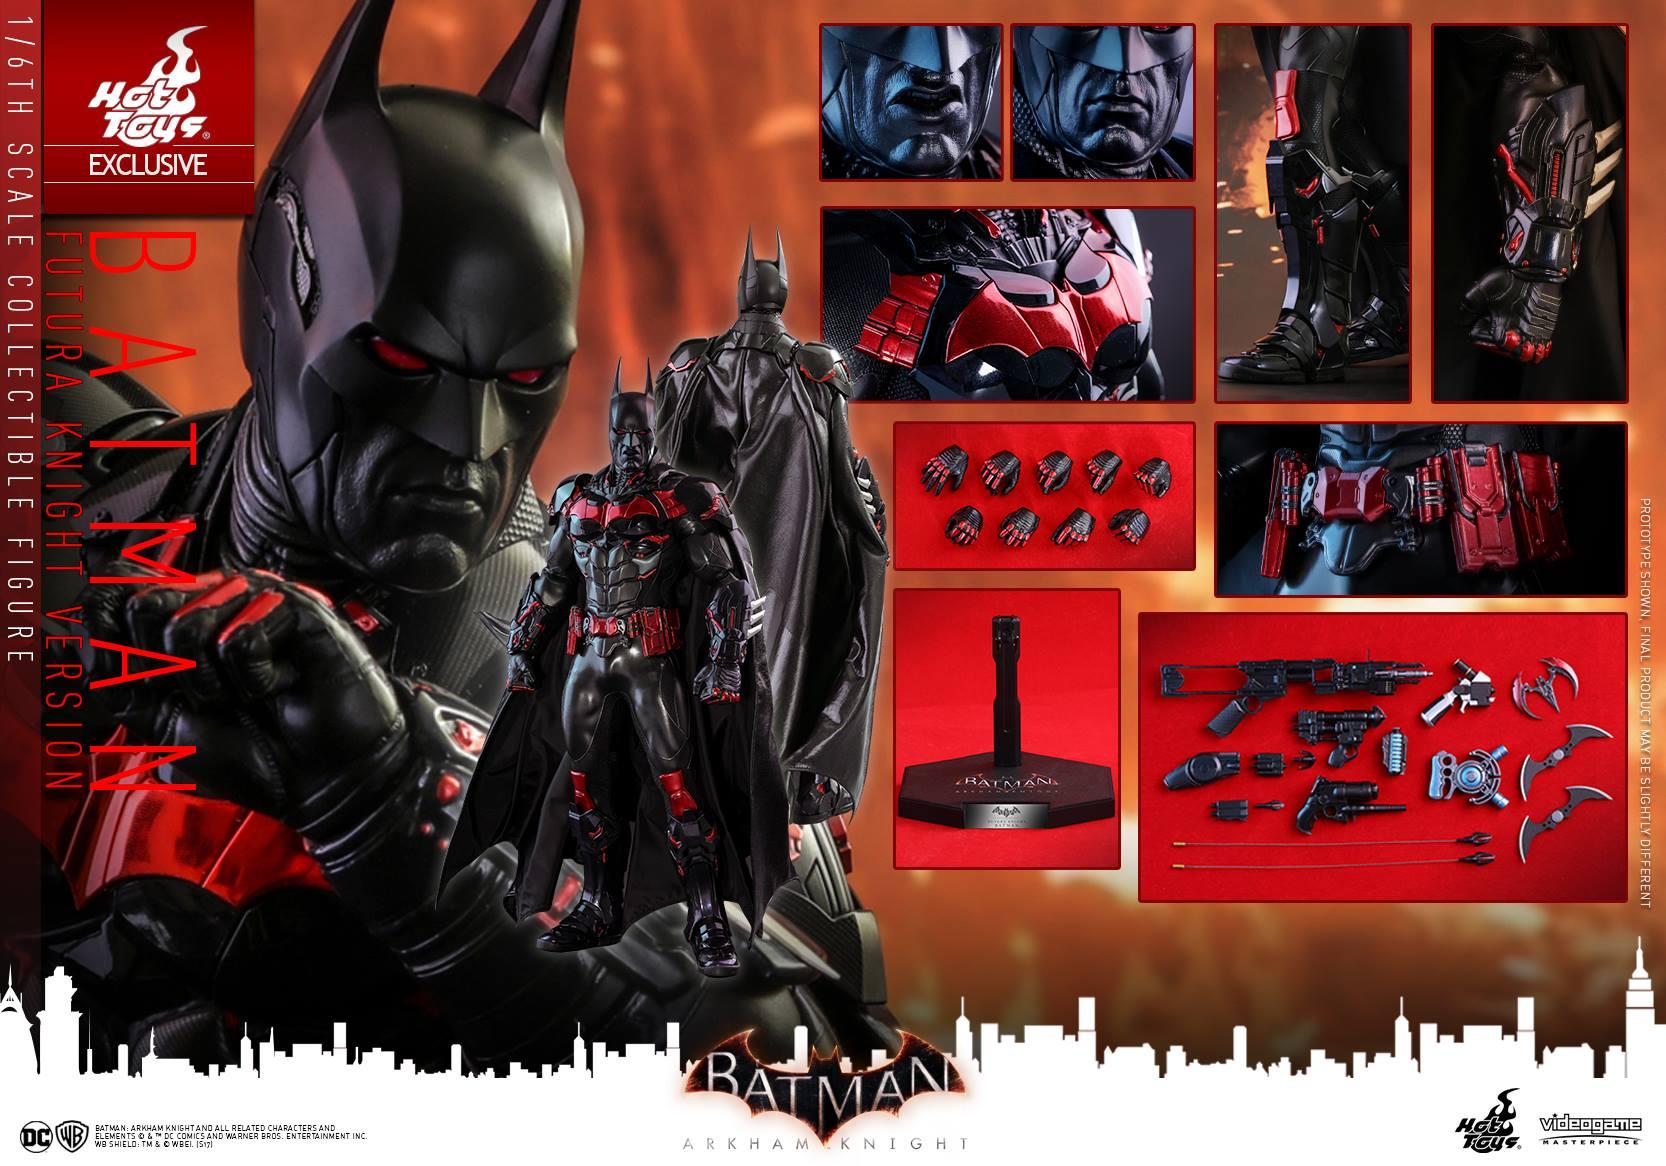 Hot Toys Batman: Arkham Knight – Batman Futura Version Sixth Scale Figure Pre-Orders